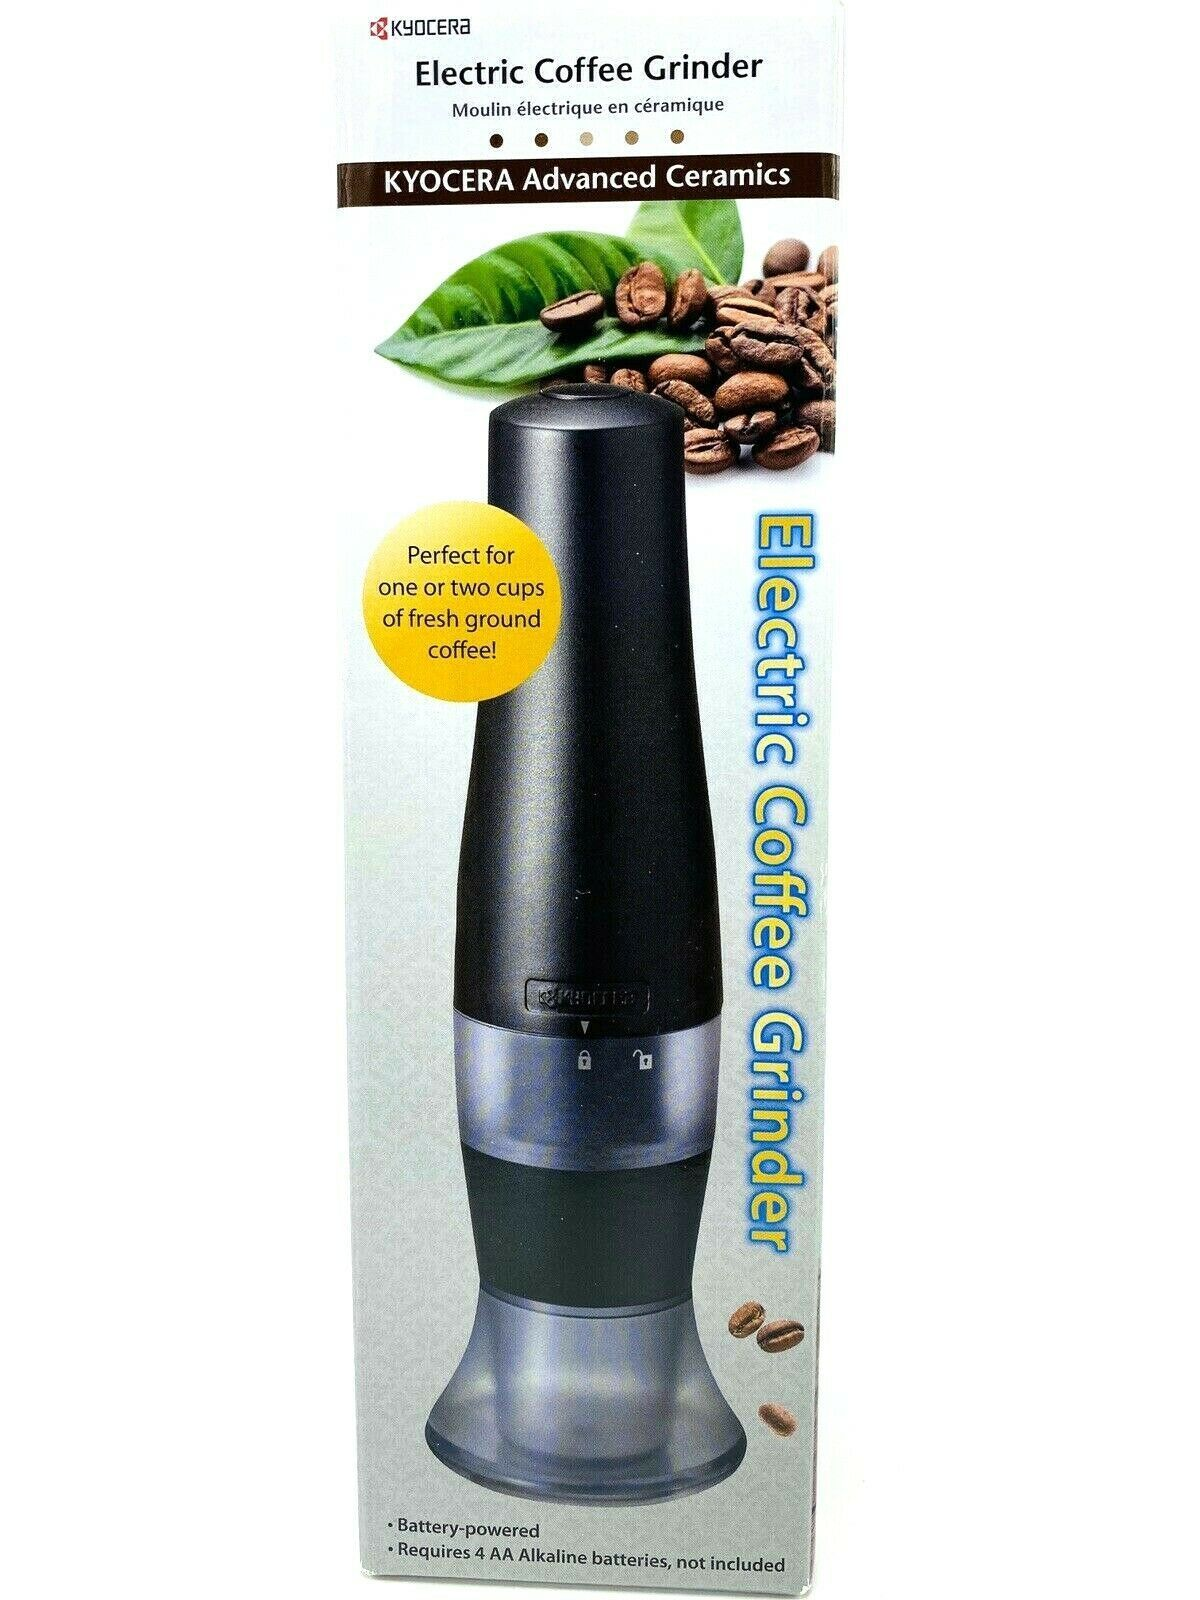 Kyocera EG70CF Electric Coffee Grinder One Size Black